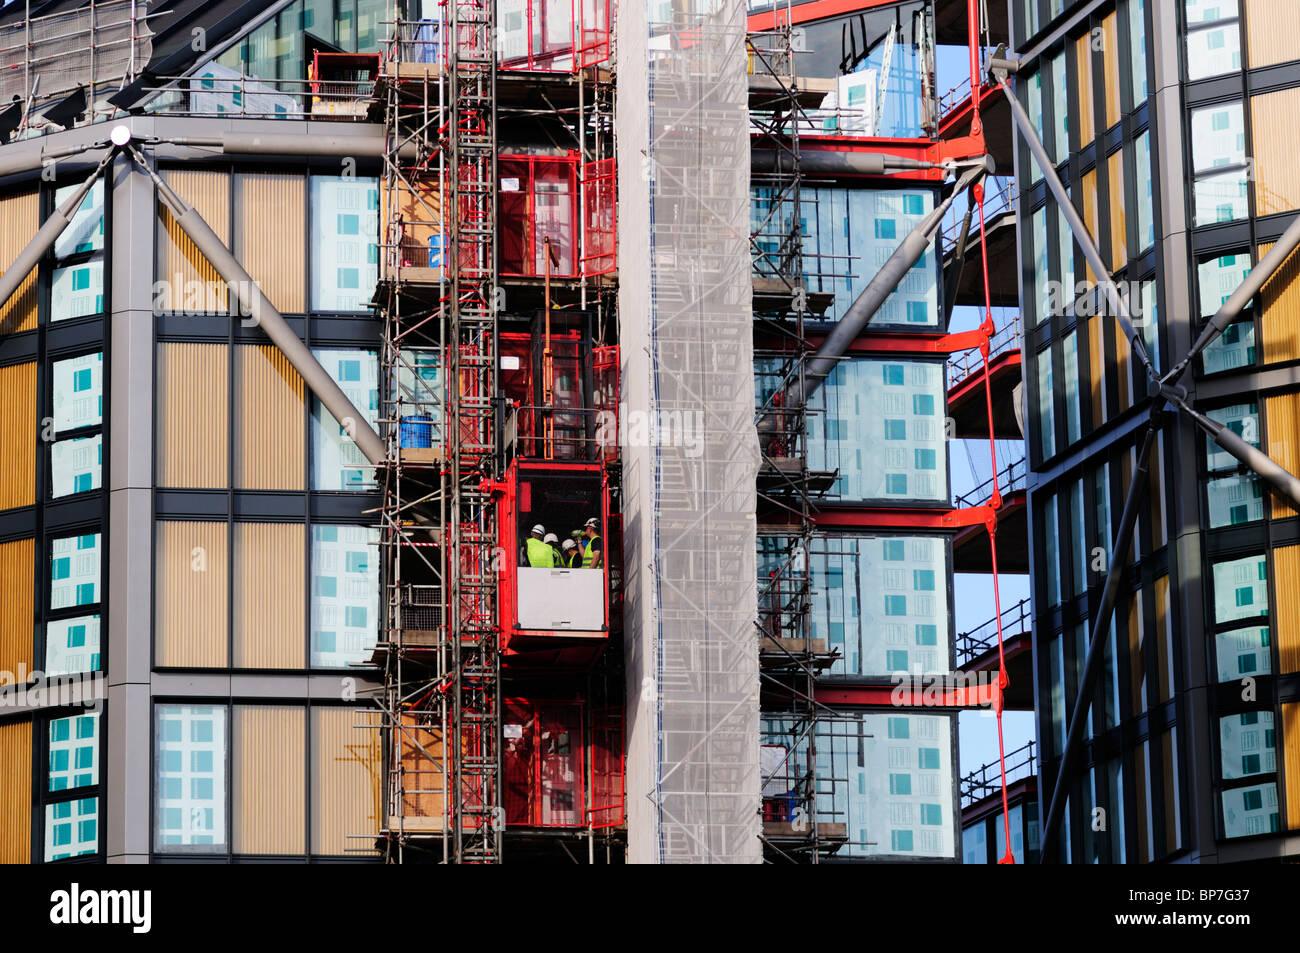 NEO Bankside construction site, Southwark, London, England, UK - Stock Image